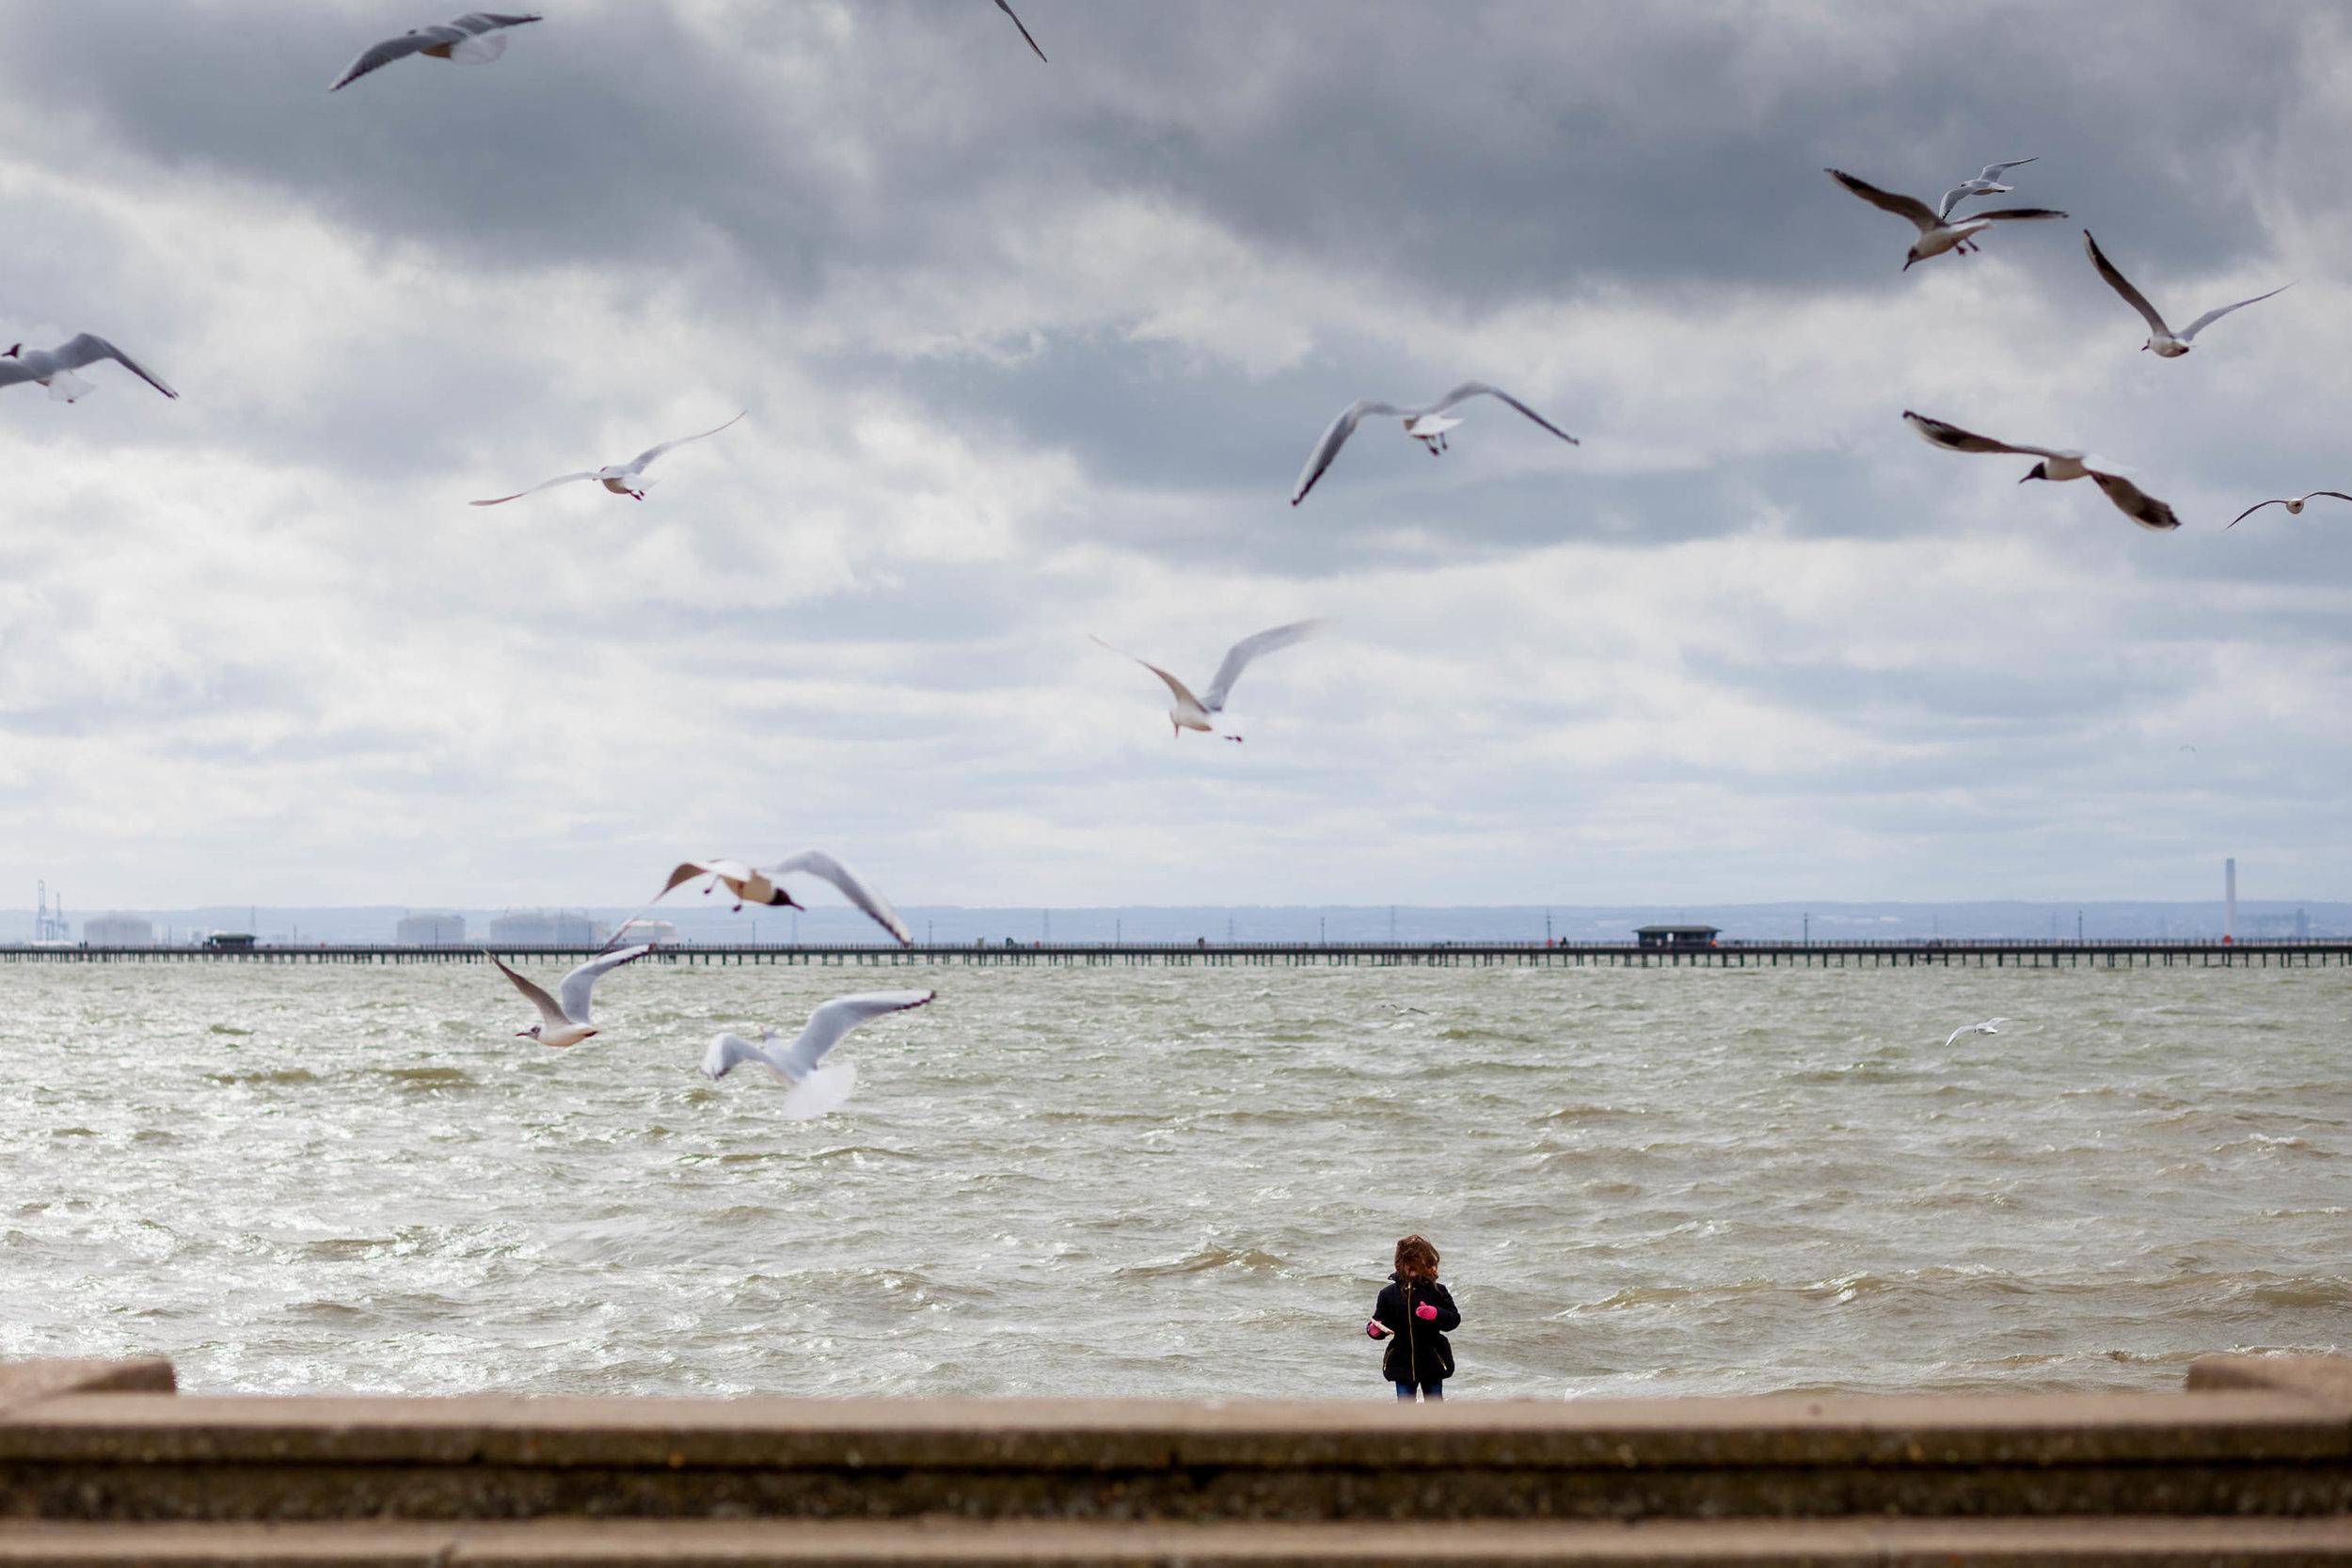 Girl feeding seaguls, Southend on Sea_3000px-60.jpg